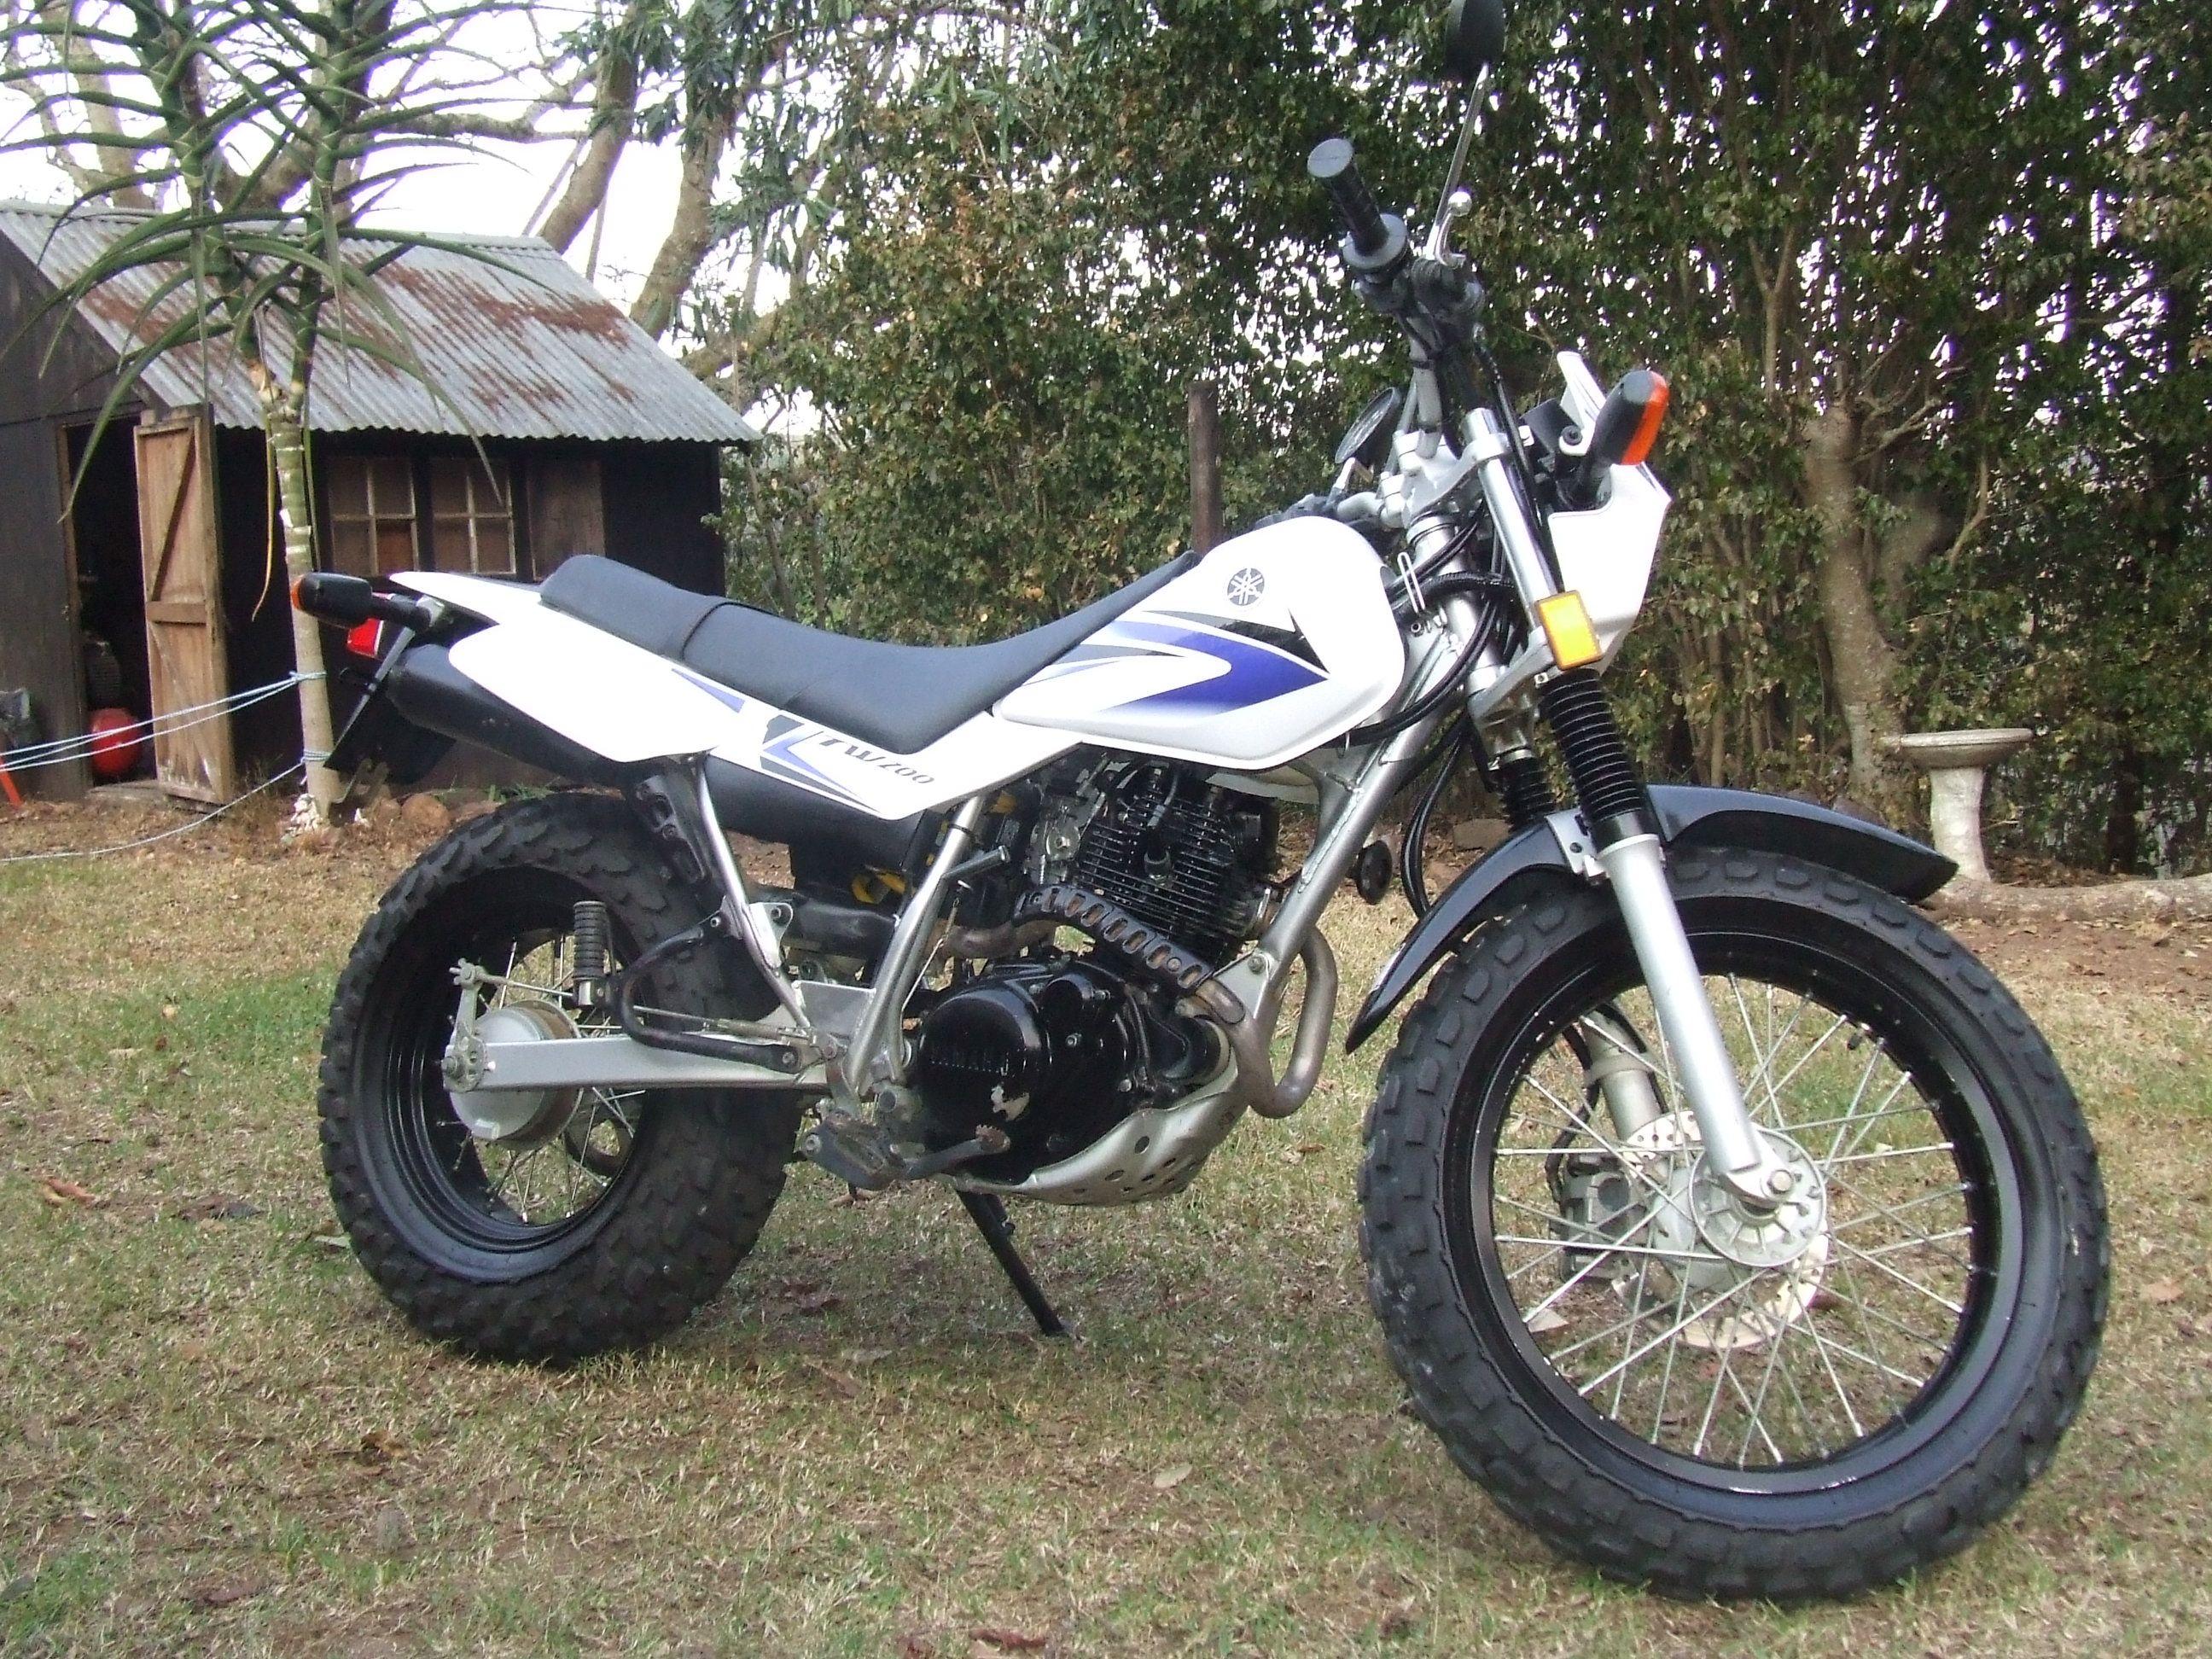 2006 Yamaha Tw200 South Africa Yamaha Tw200 Tw200 Yamaha